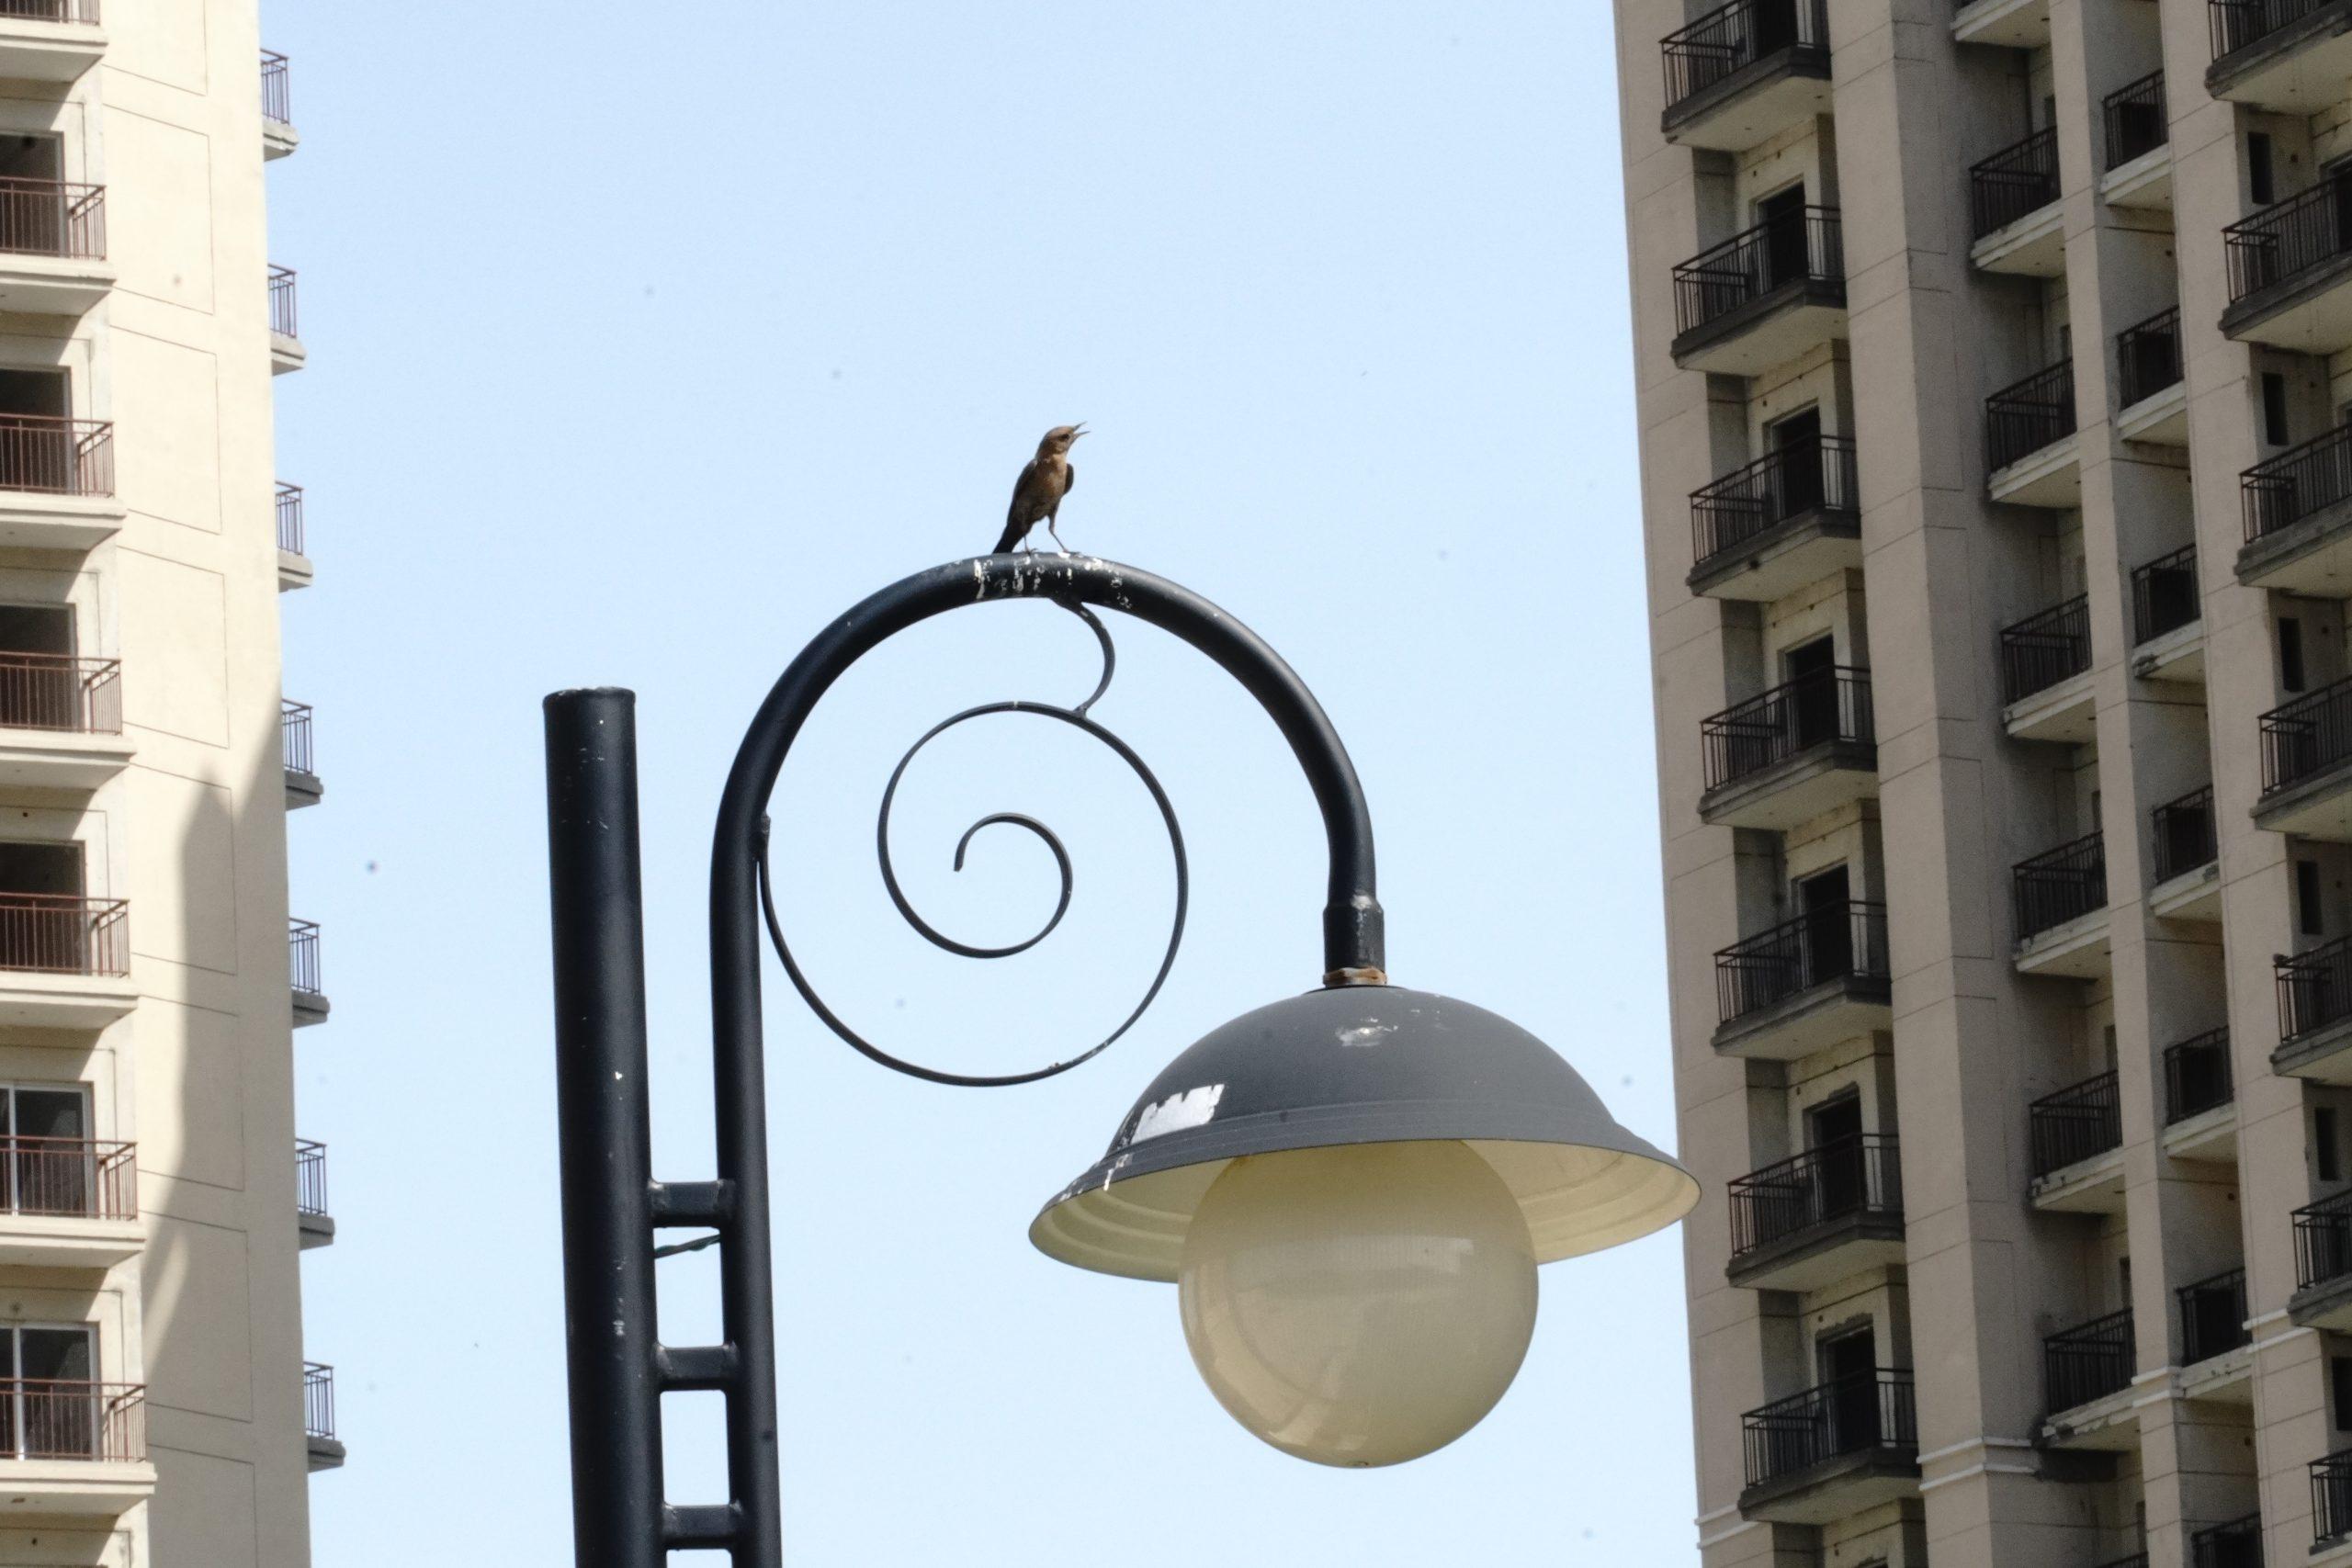 bird on top of a street lamp